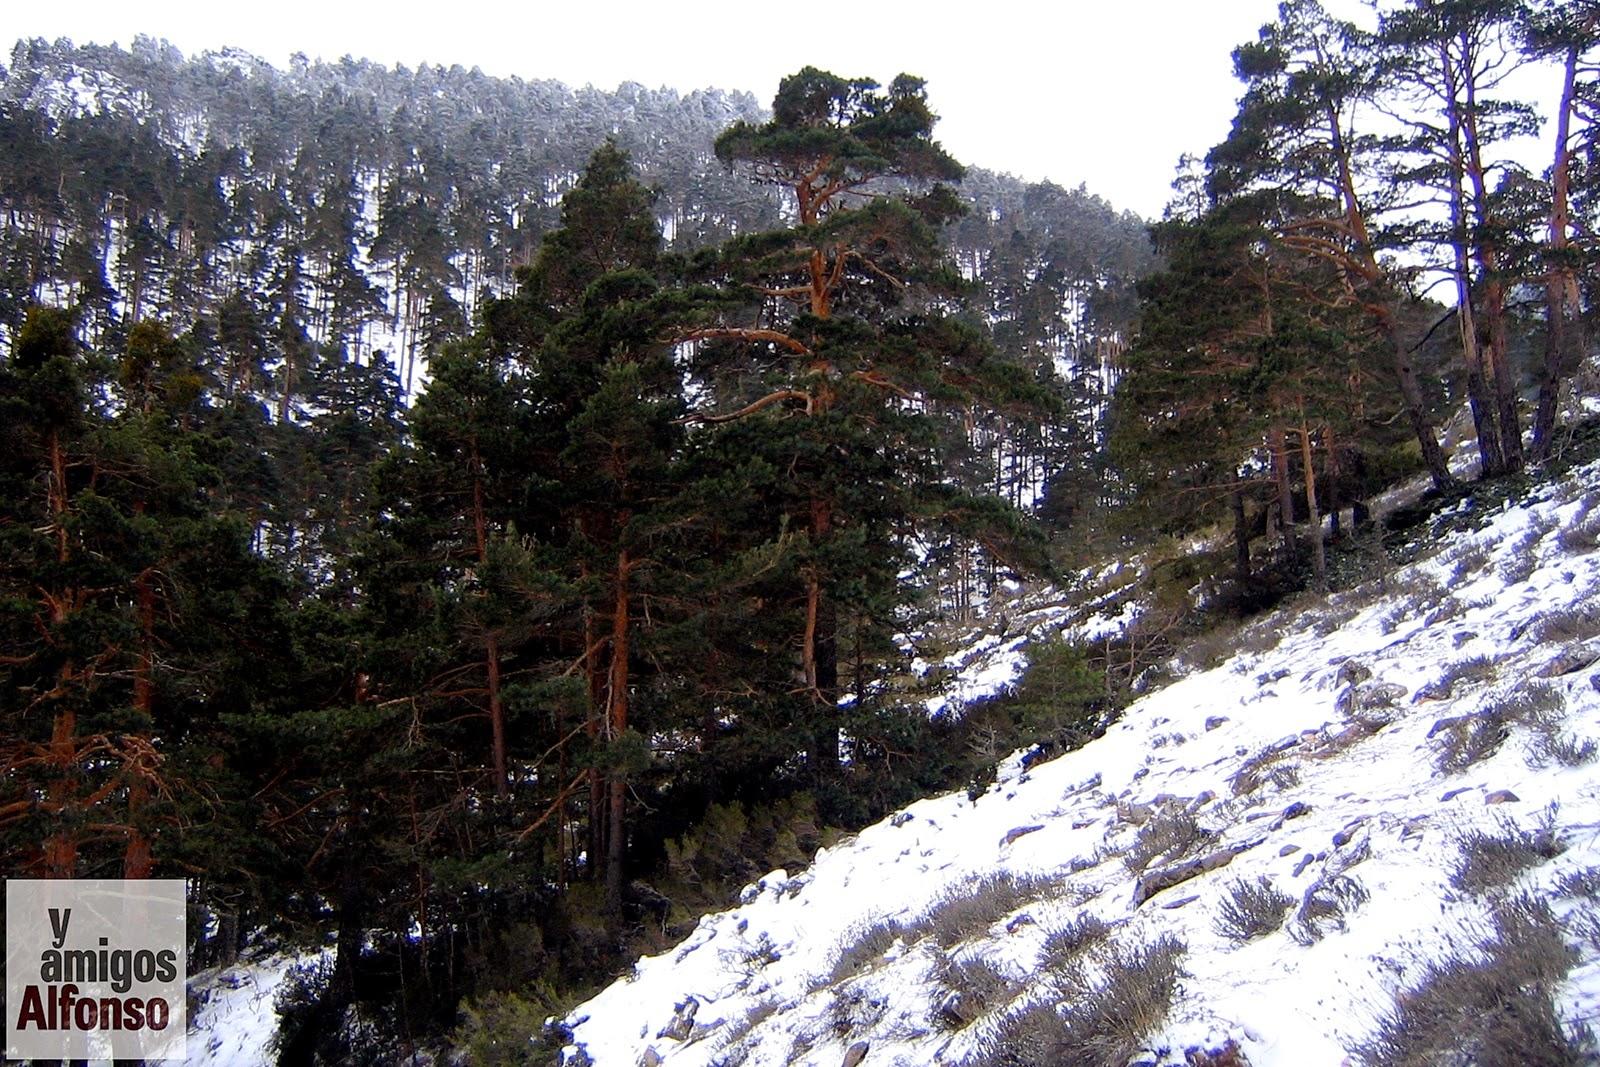 Nieve en San Rafael - Alfonsoyamigos